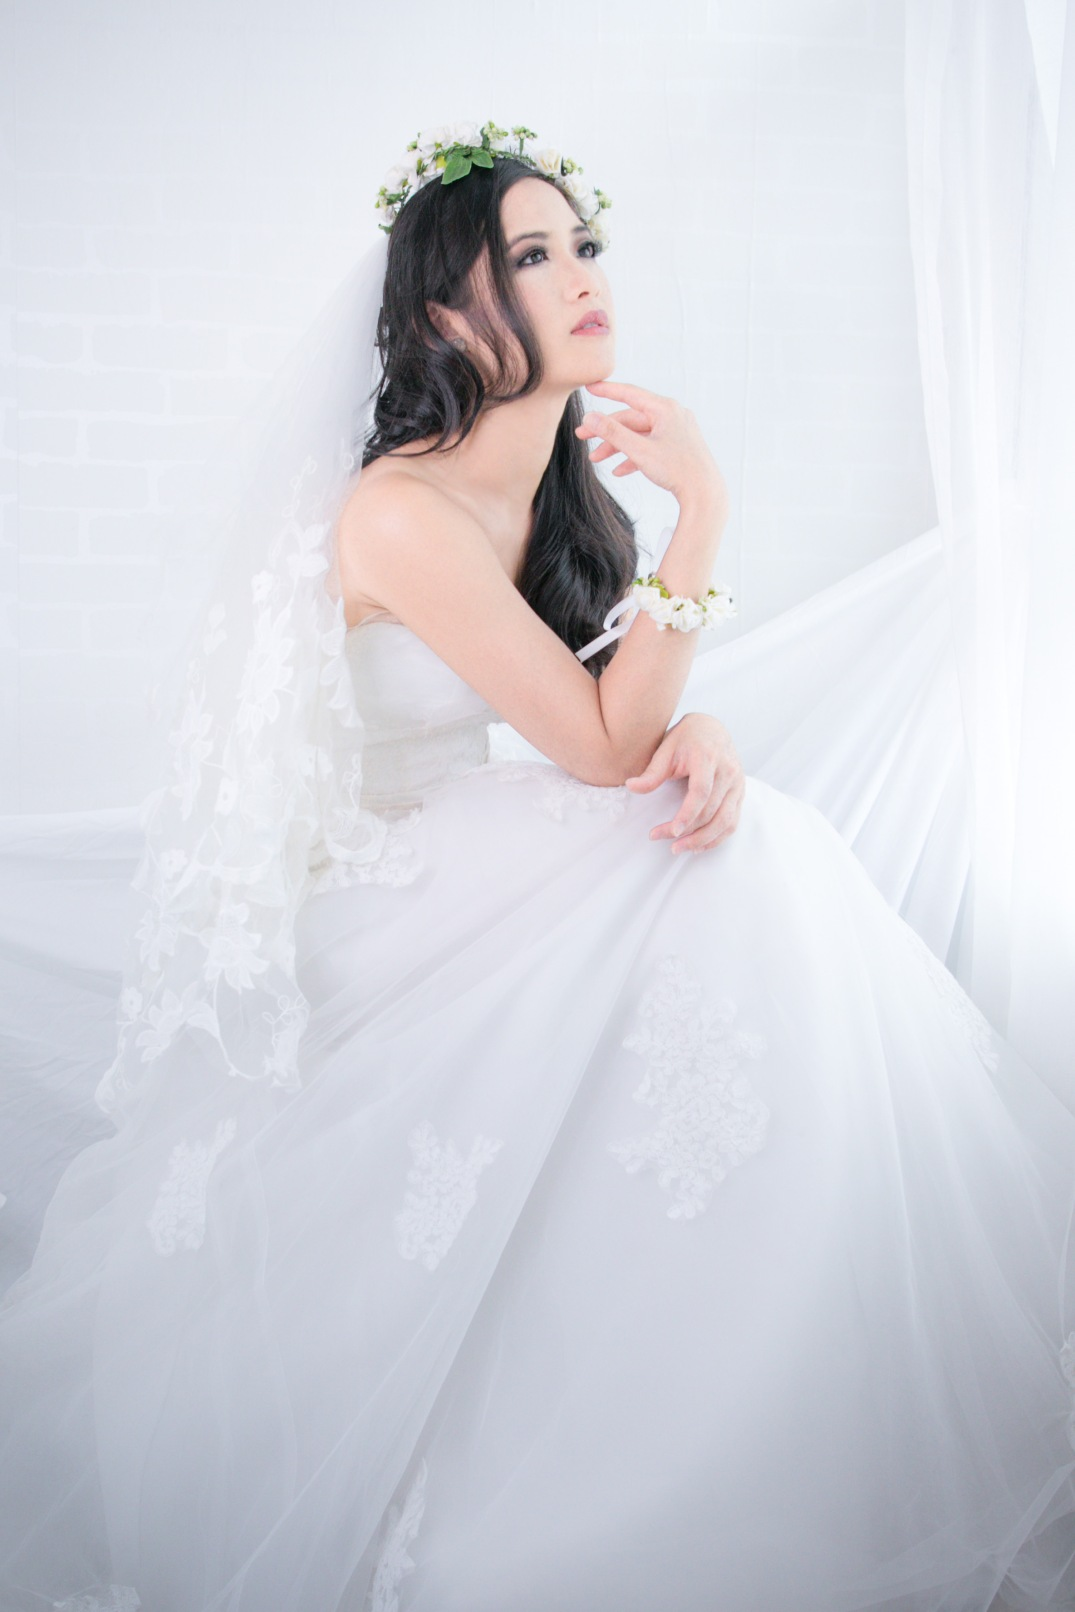 wedding boudoir photography HK by paulstylist-27.JPG